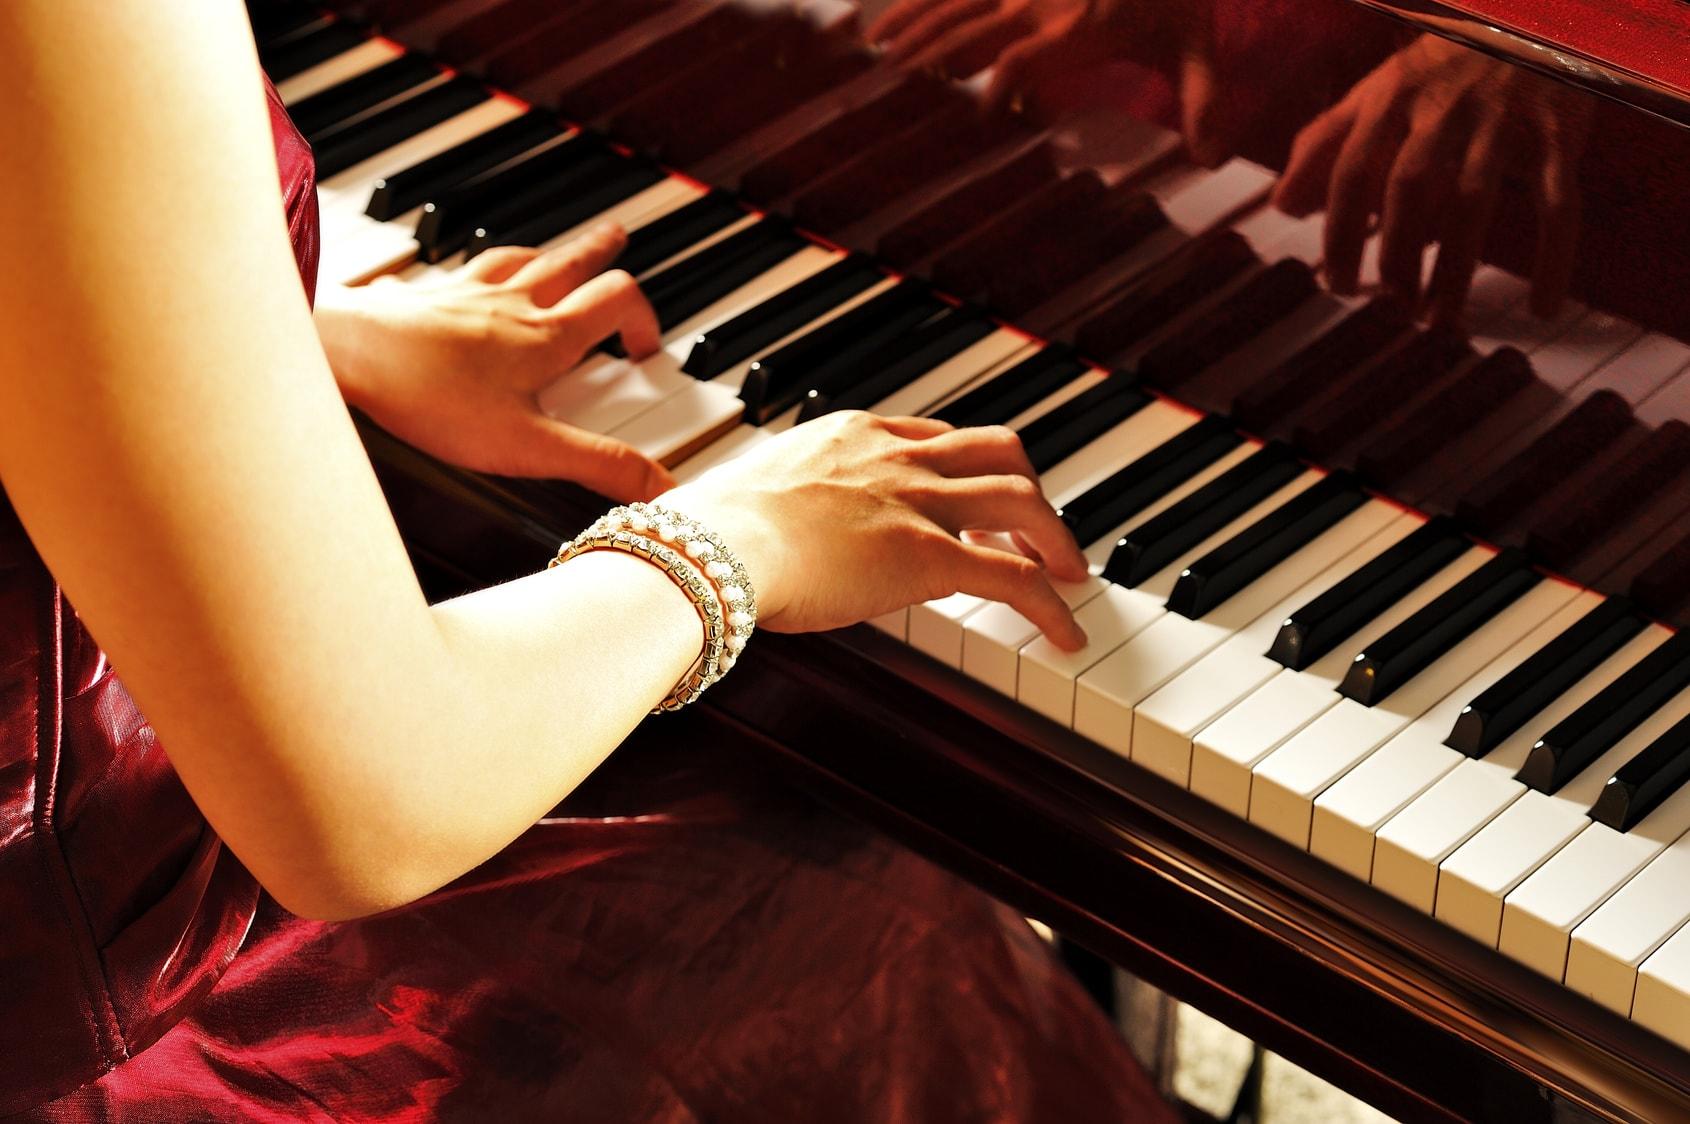 6-luu-y-khi-tap-hat-va-dan-piano-cung-luc-2